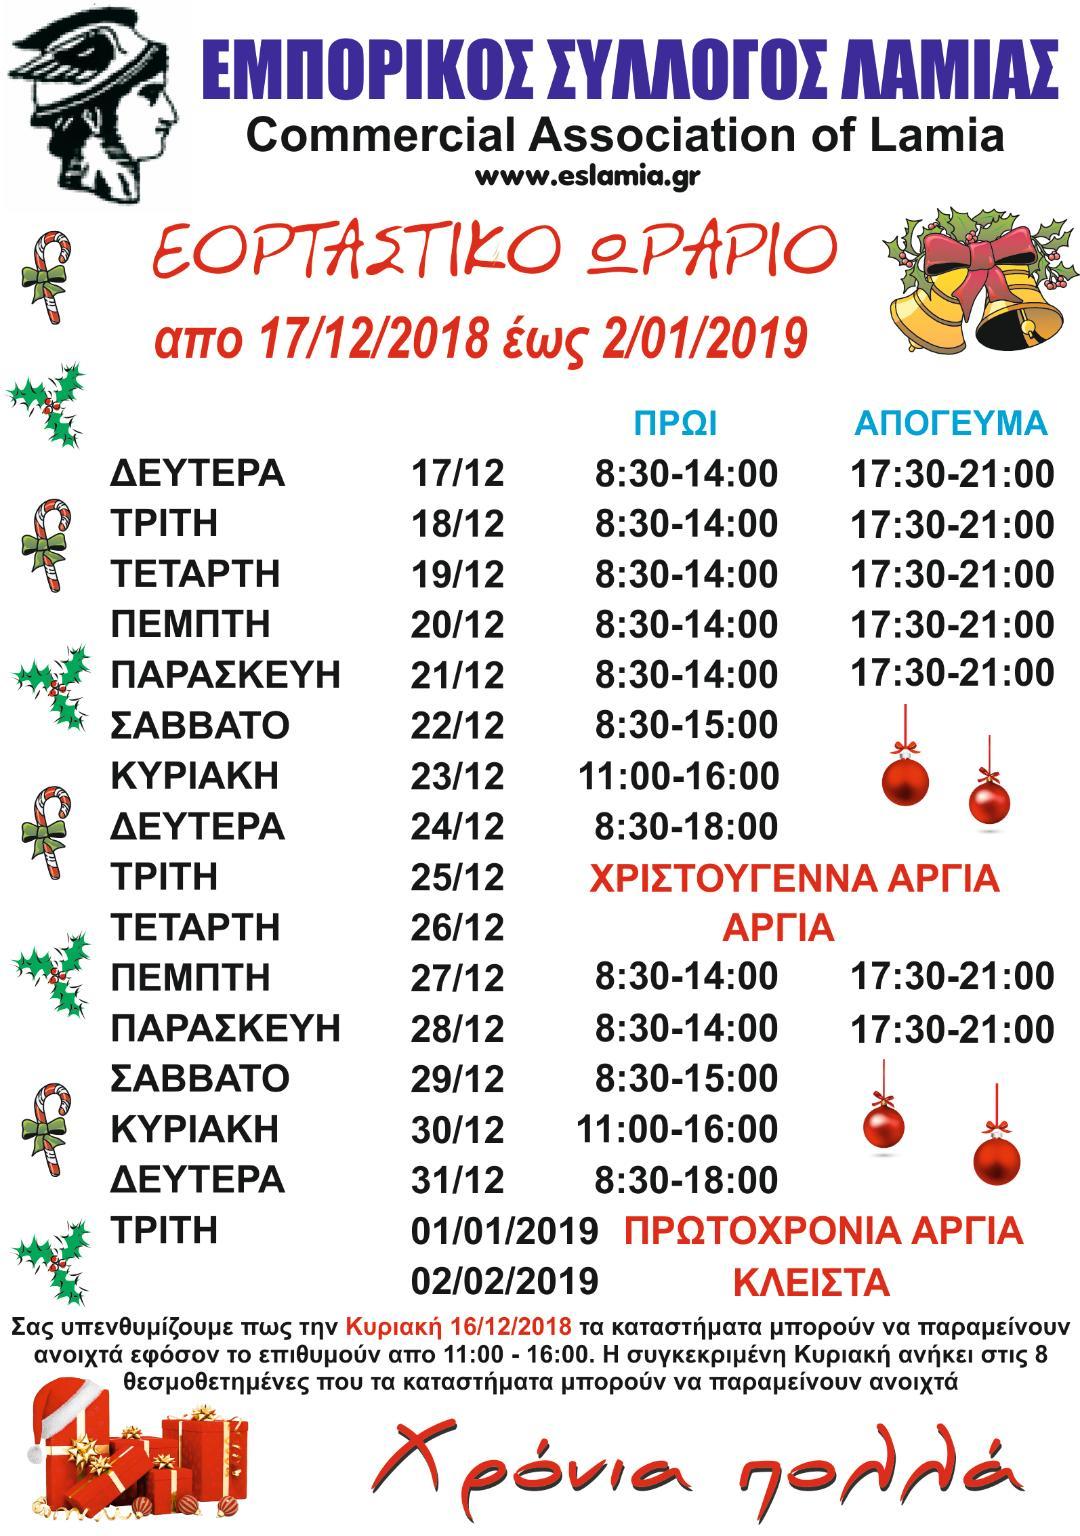 228da030a395 Δείτε το εορταστικό ωράριο που ανακοίνωσε ο Εμπορικός Σύλλογος Λαμίας